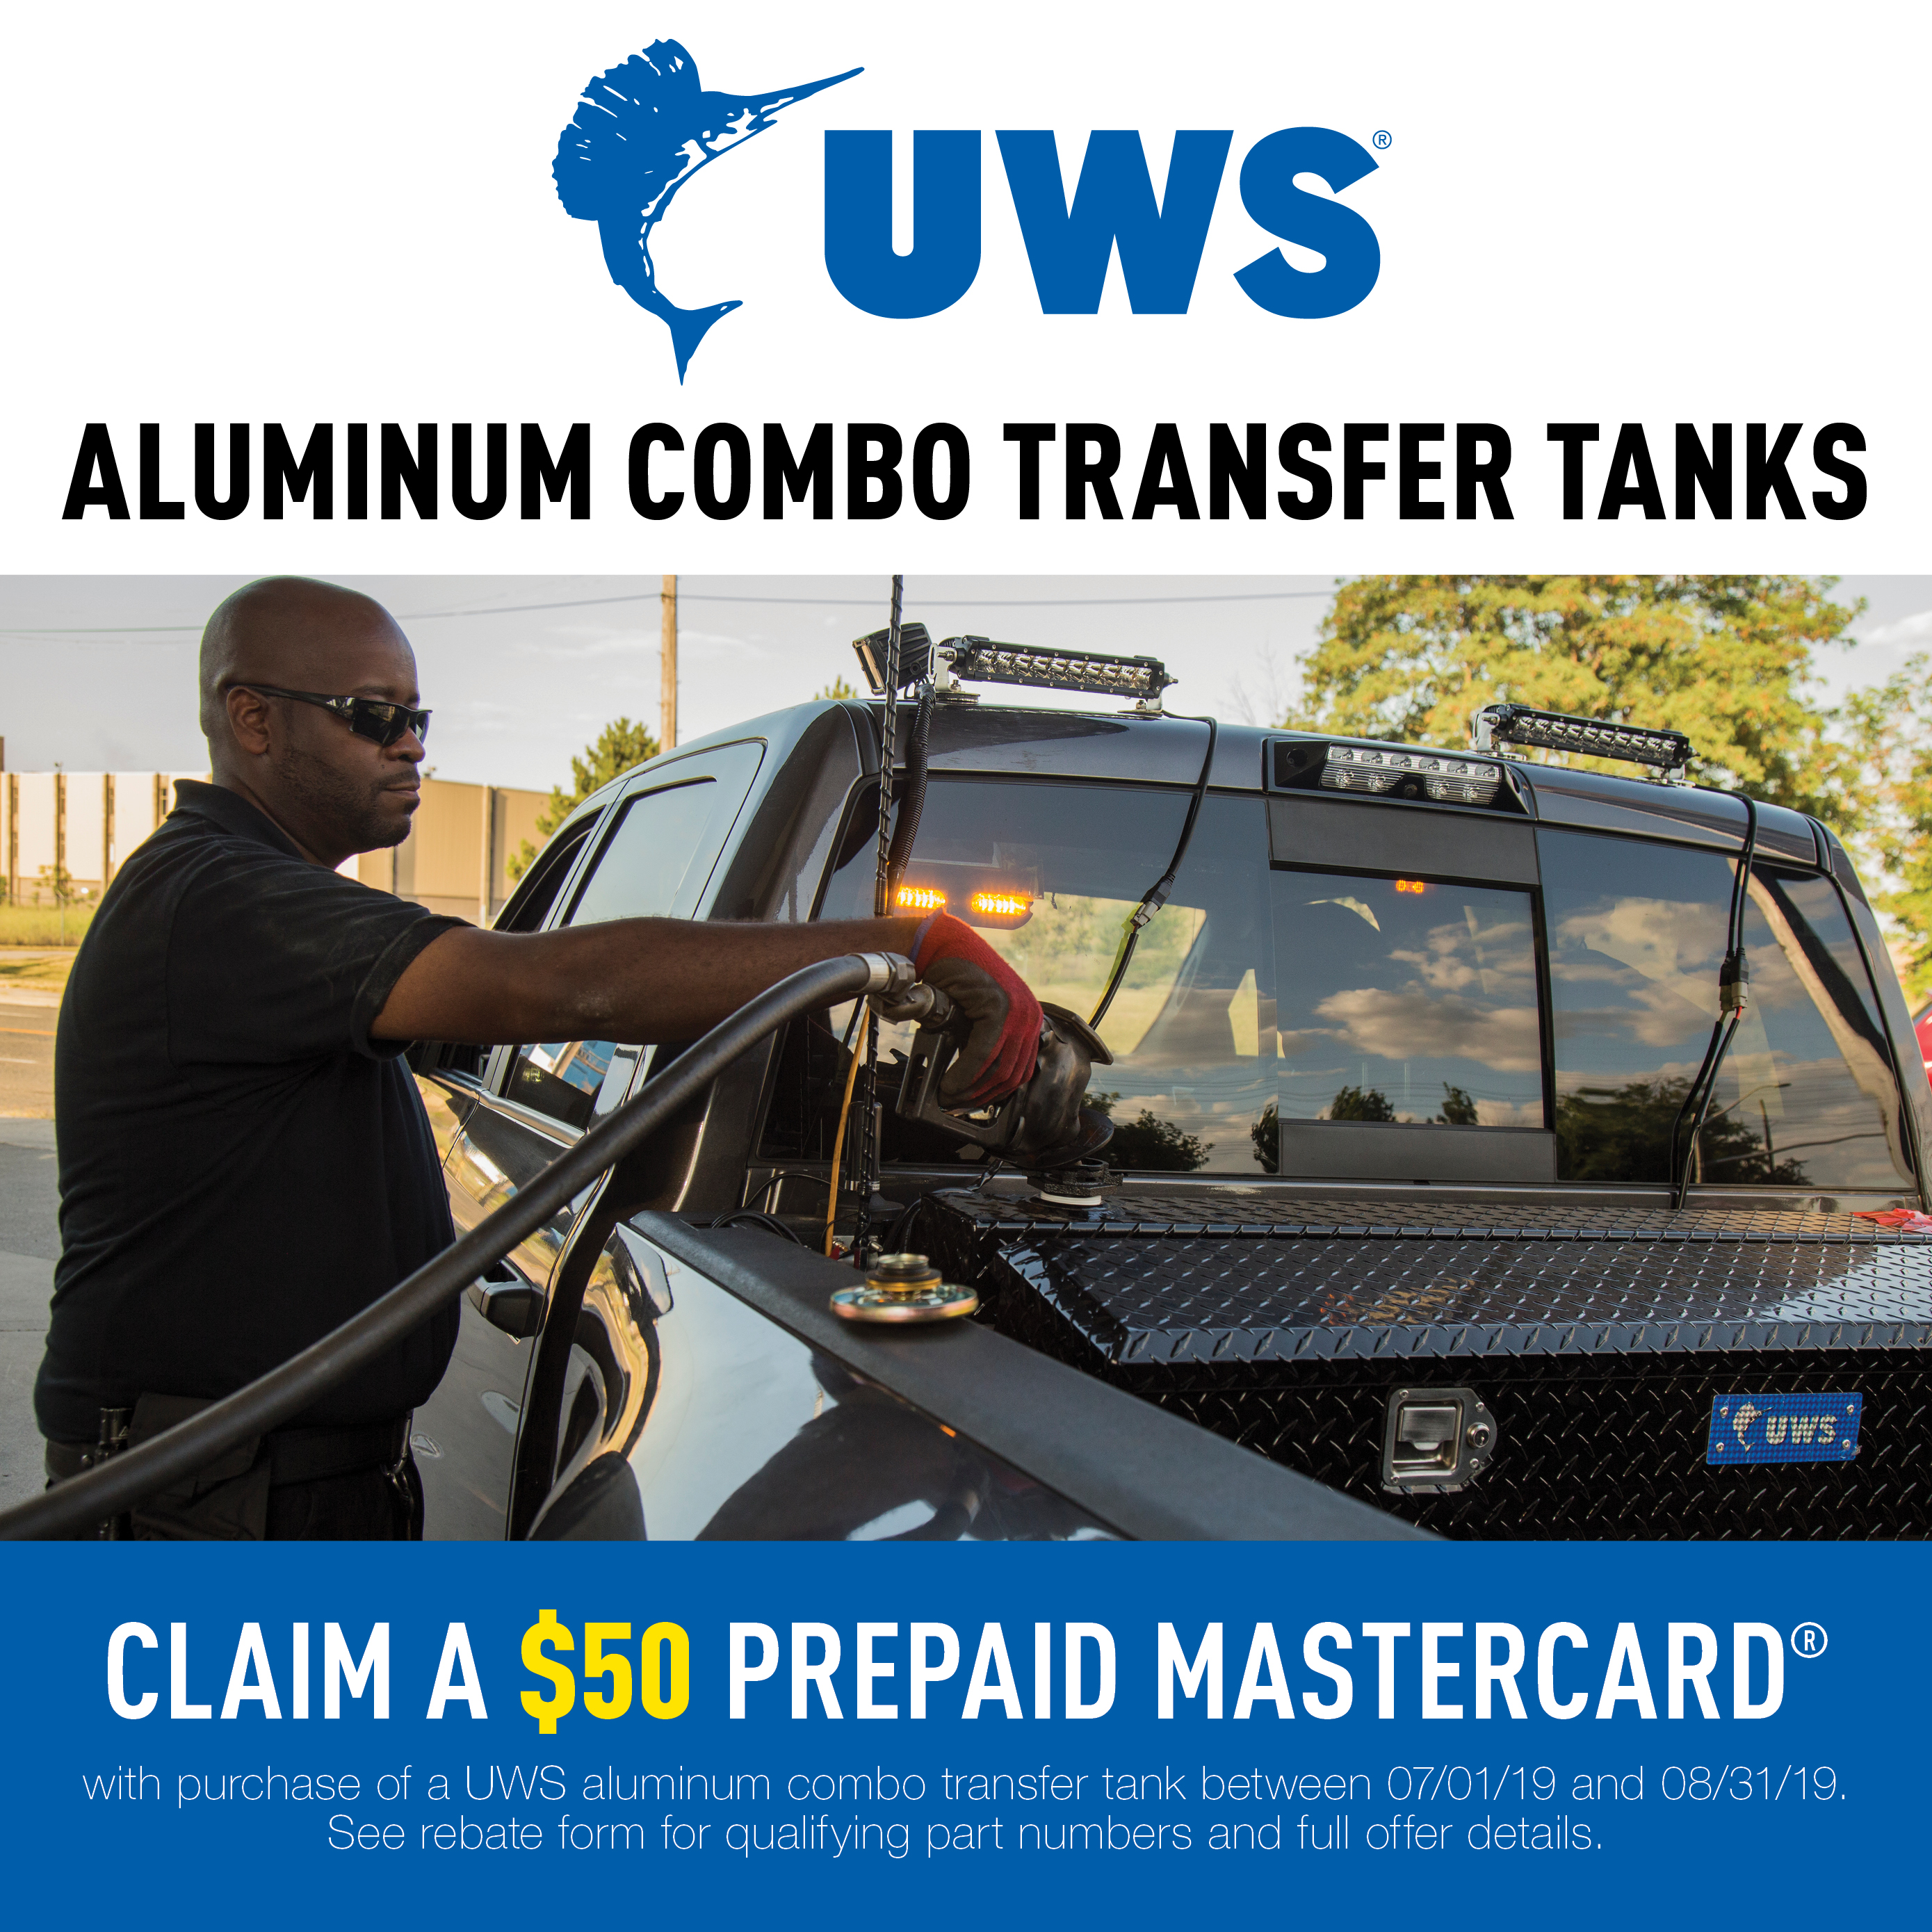 UWS Aluminum Combo Transfer Tanks Promotion 2019